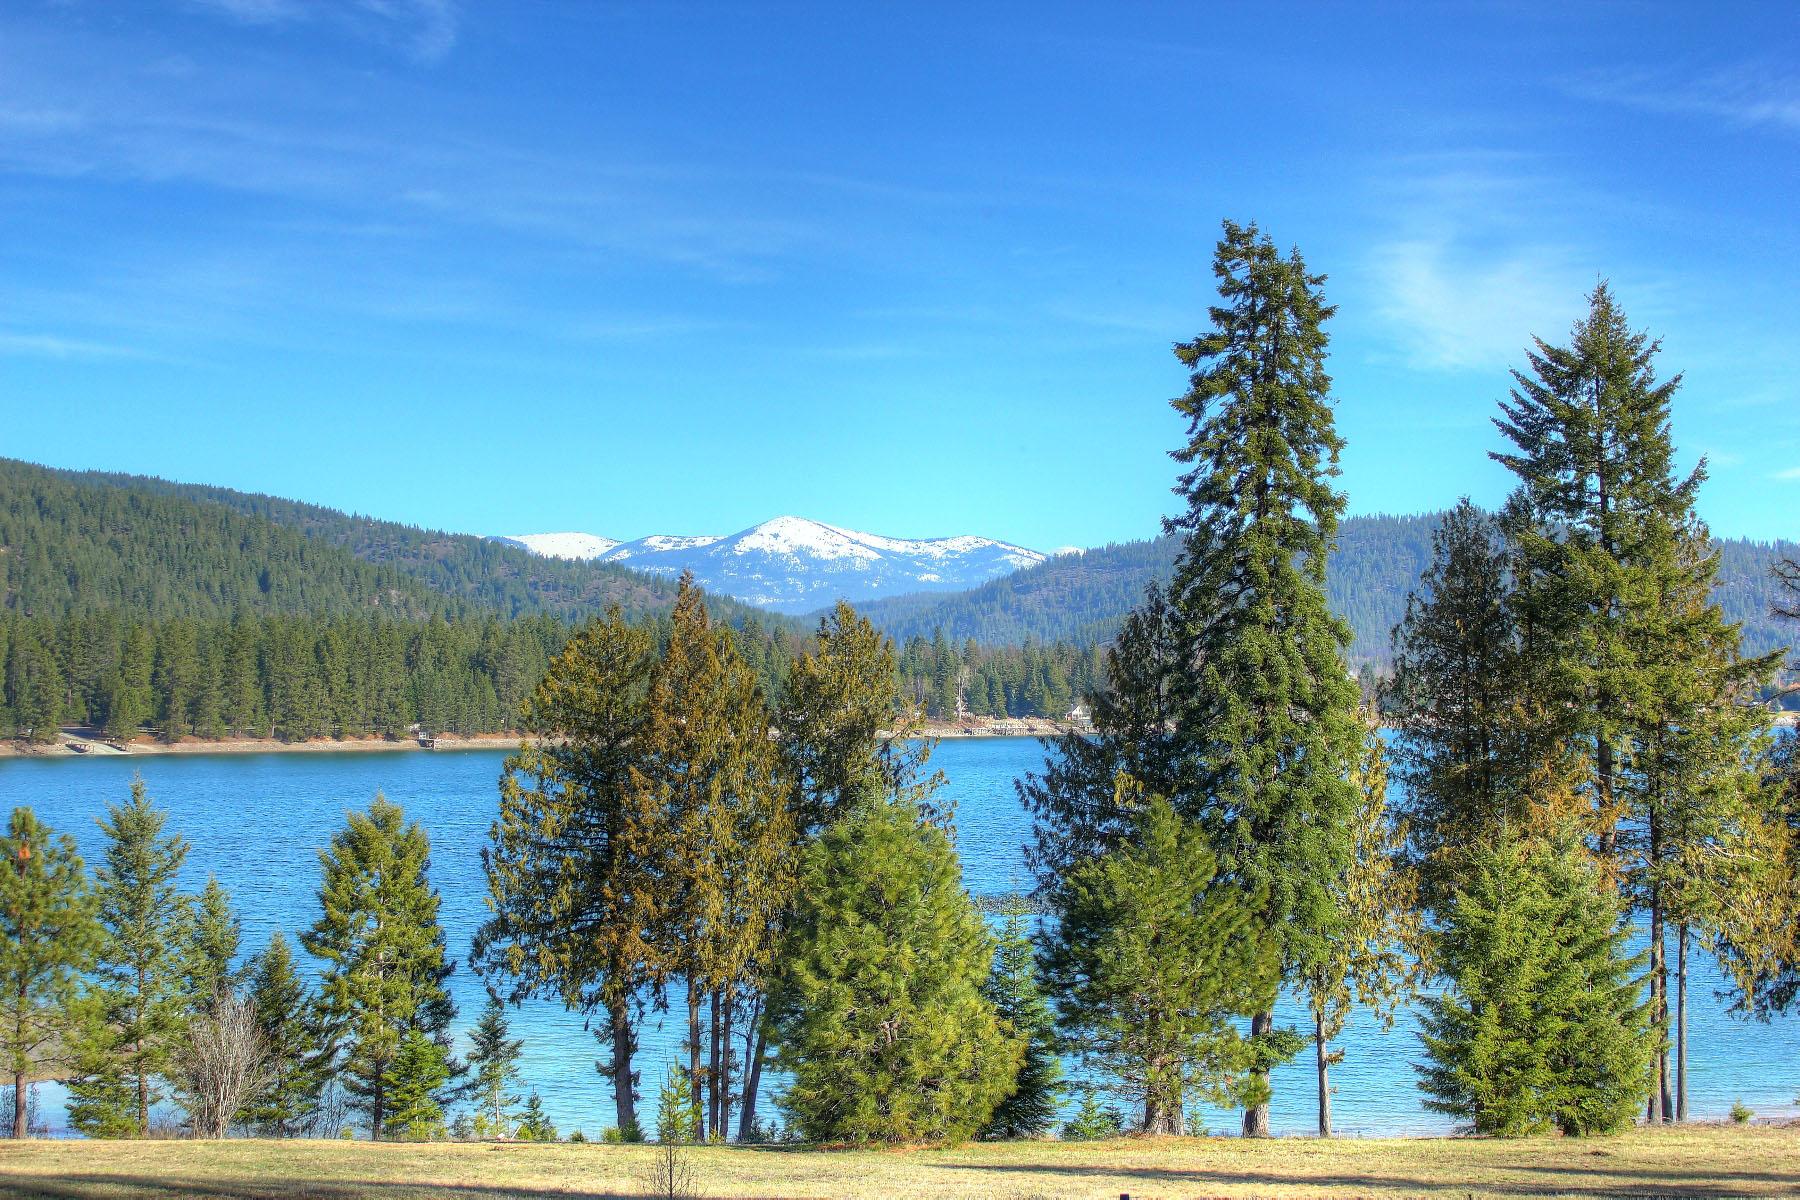 Terreno per Vendita alle ore The Crossings at Willow Bay Deeter Drive Lot 52 Priest River, Idaho, 83856 Stati Uniti